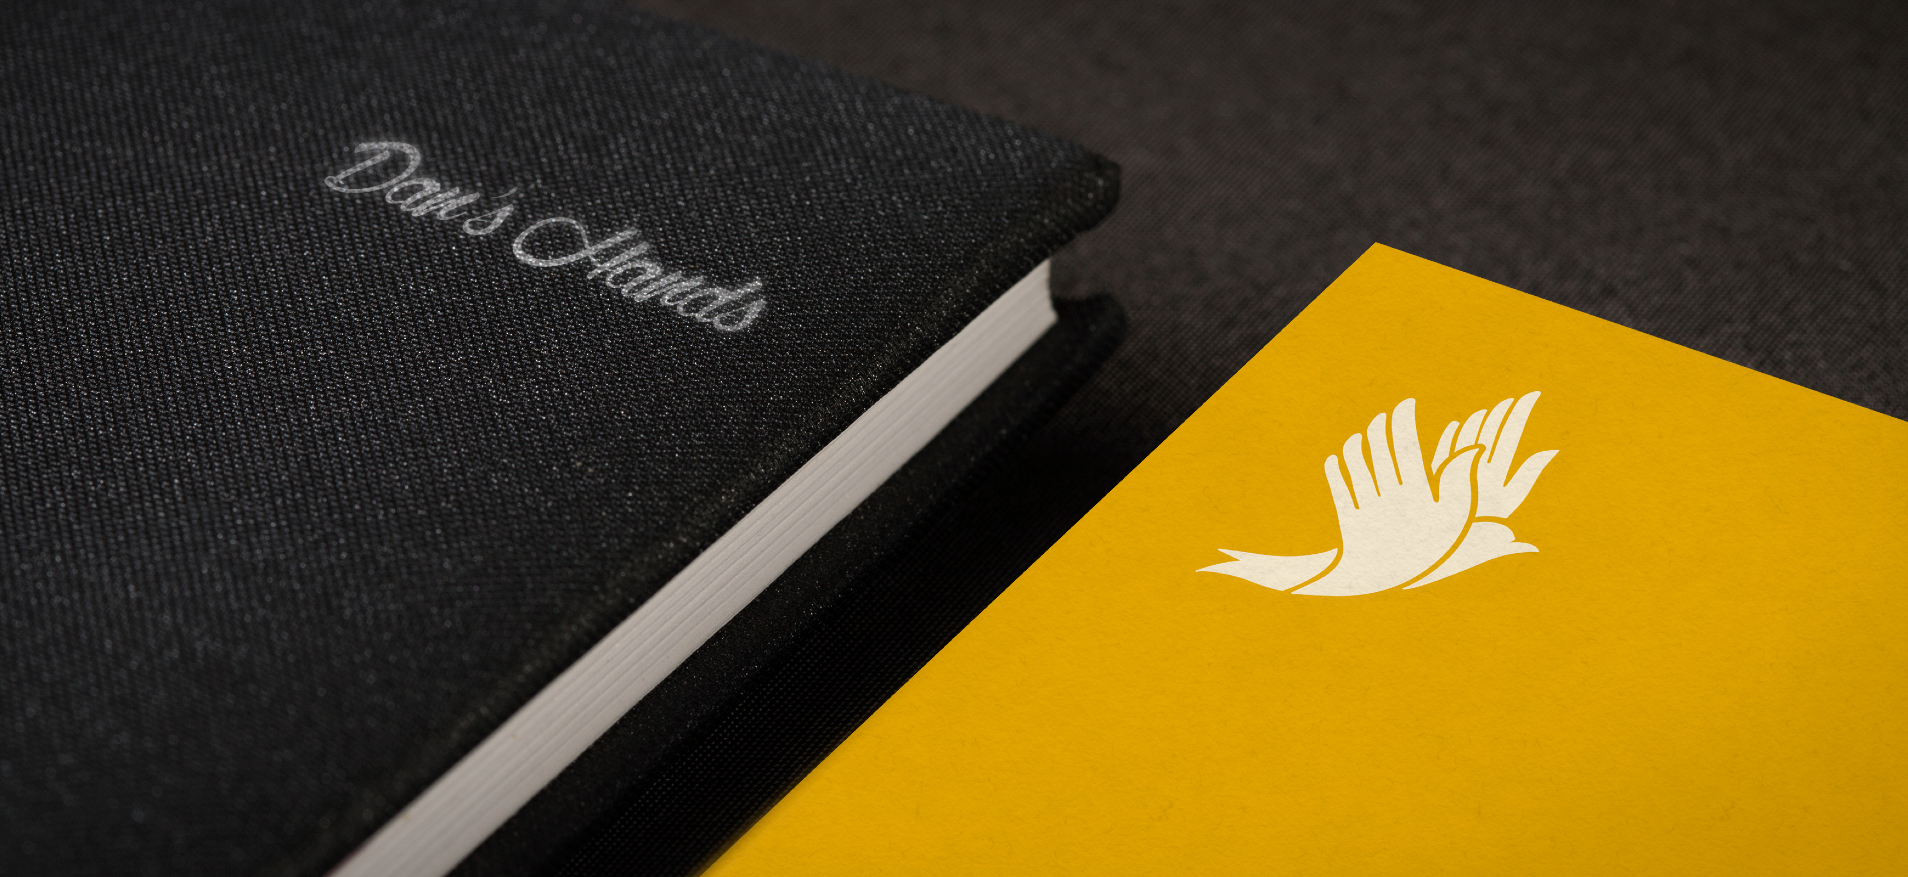 Dove-Book_edited.jpg